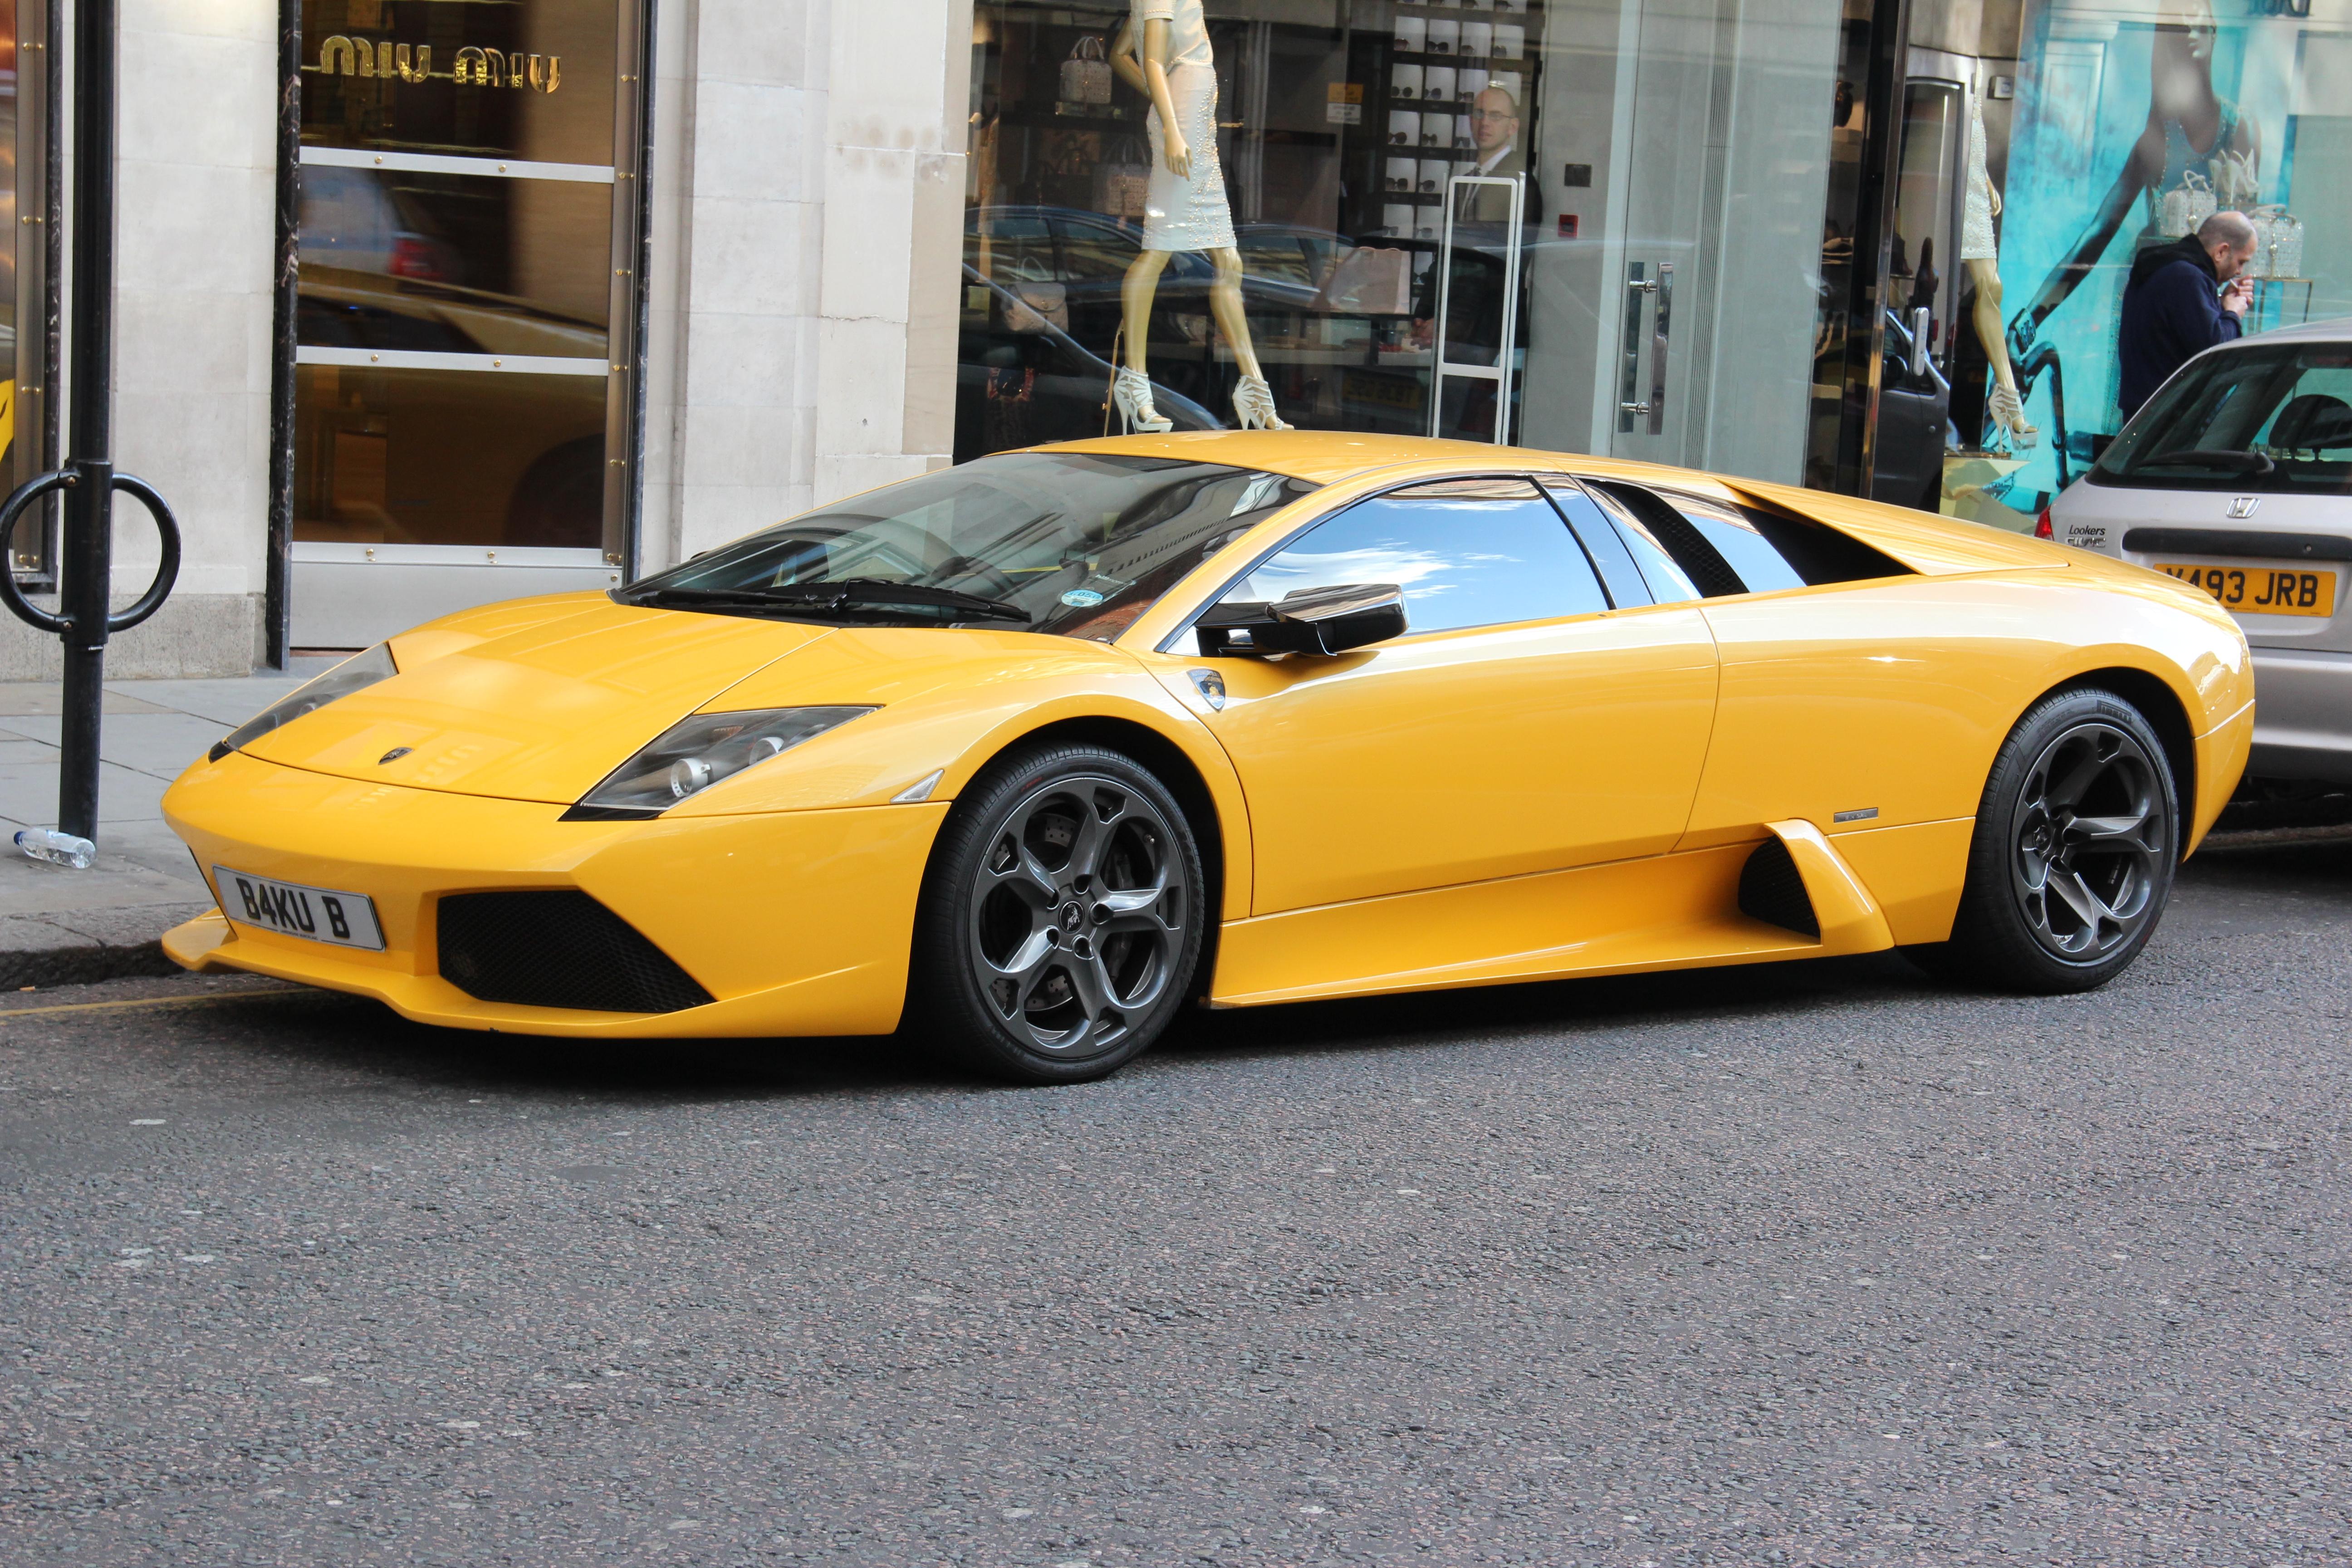 Lamborghini Murcilago Wikipedia How To Fold Fitted Sheets The Diagram